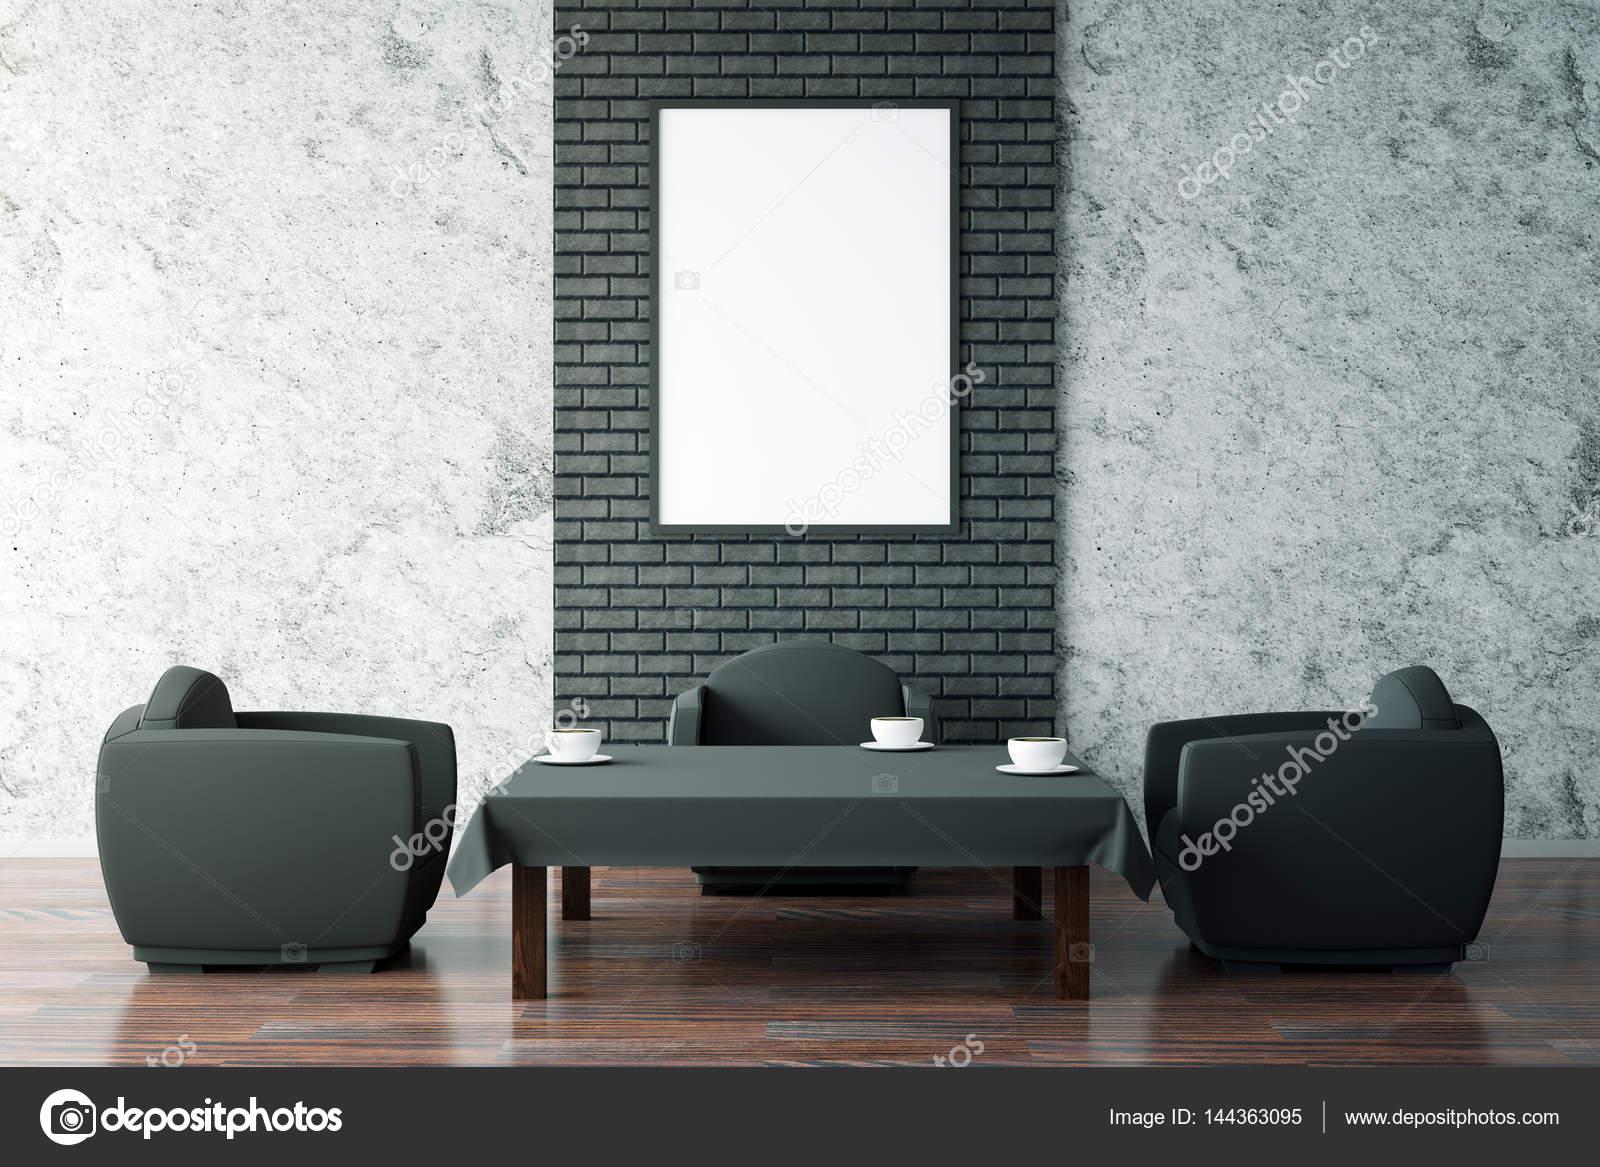 Mesa de café negro y marco blanco — Foto de stock © peshkova #144363095